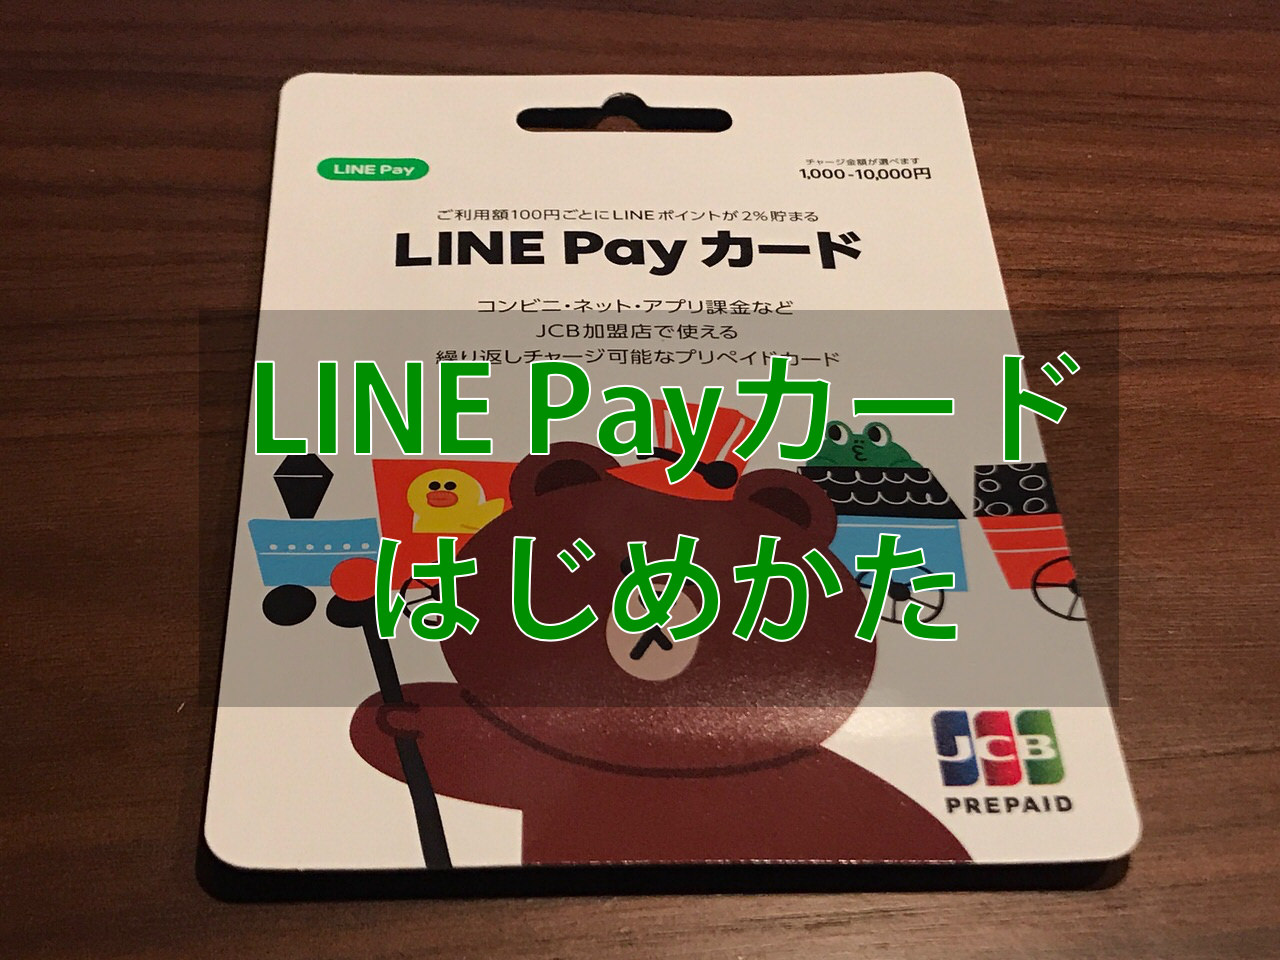 Line pay card 8722 1